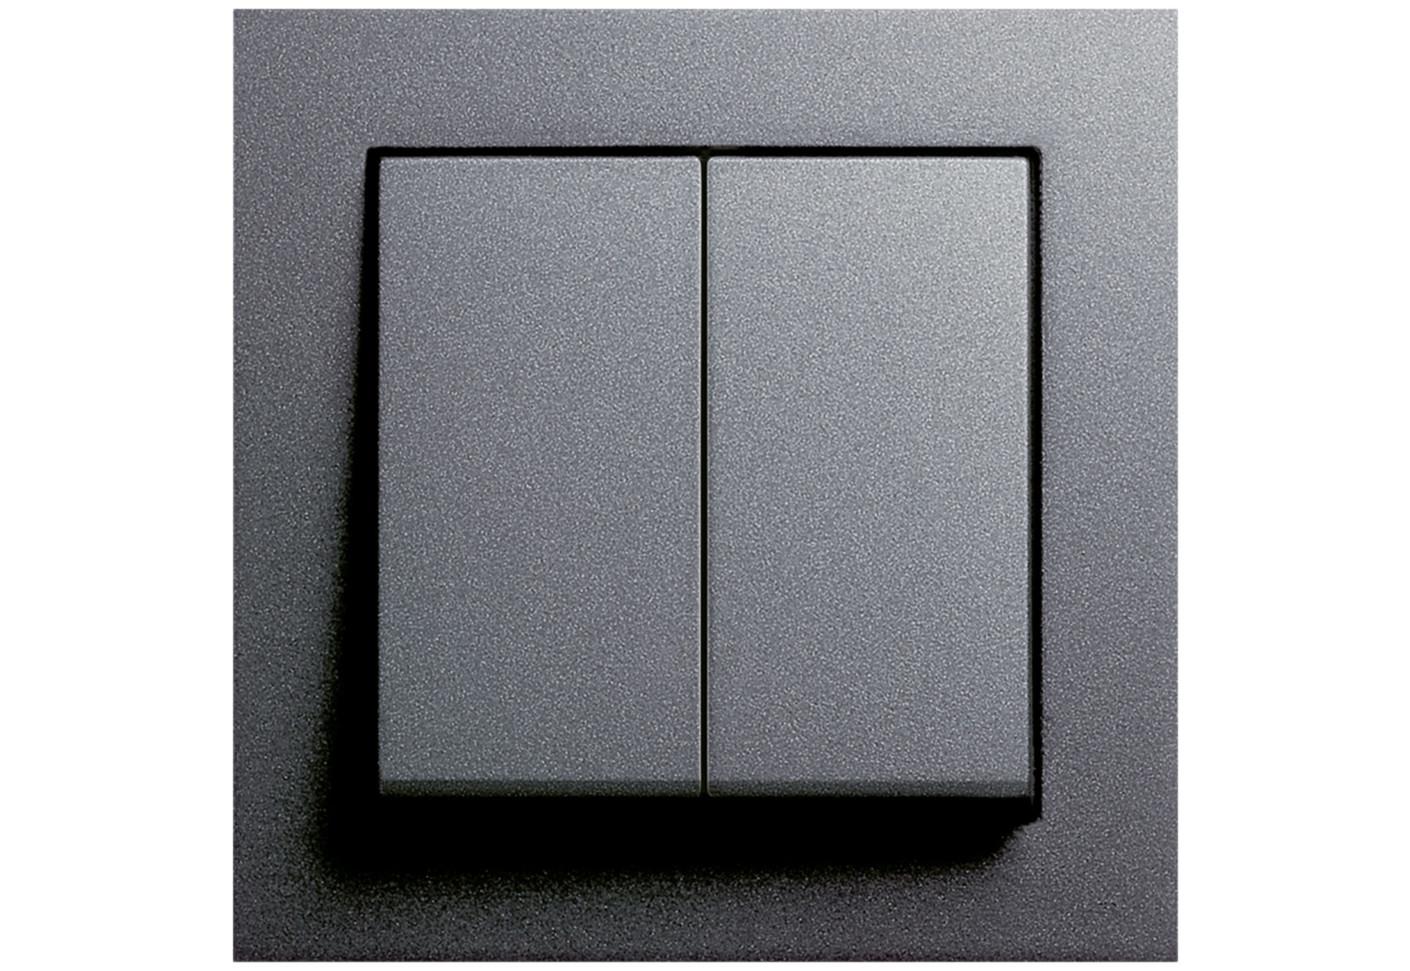 e2 series dimmer by gira stylepark. Black Bedroom Furniture Sets. Home Design Ideas